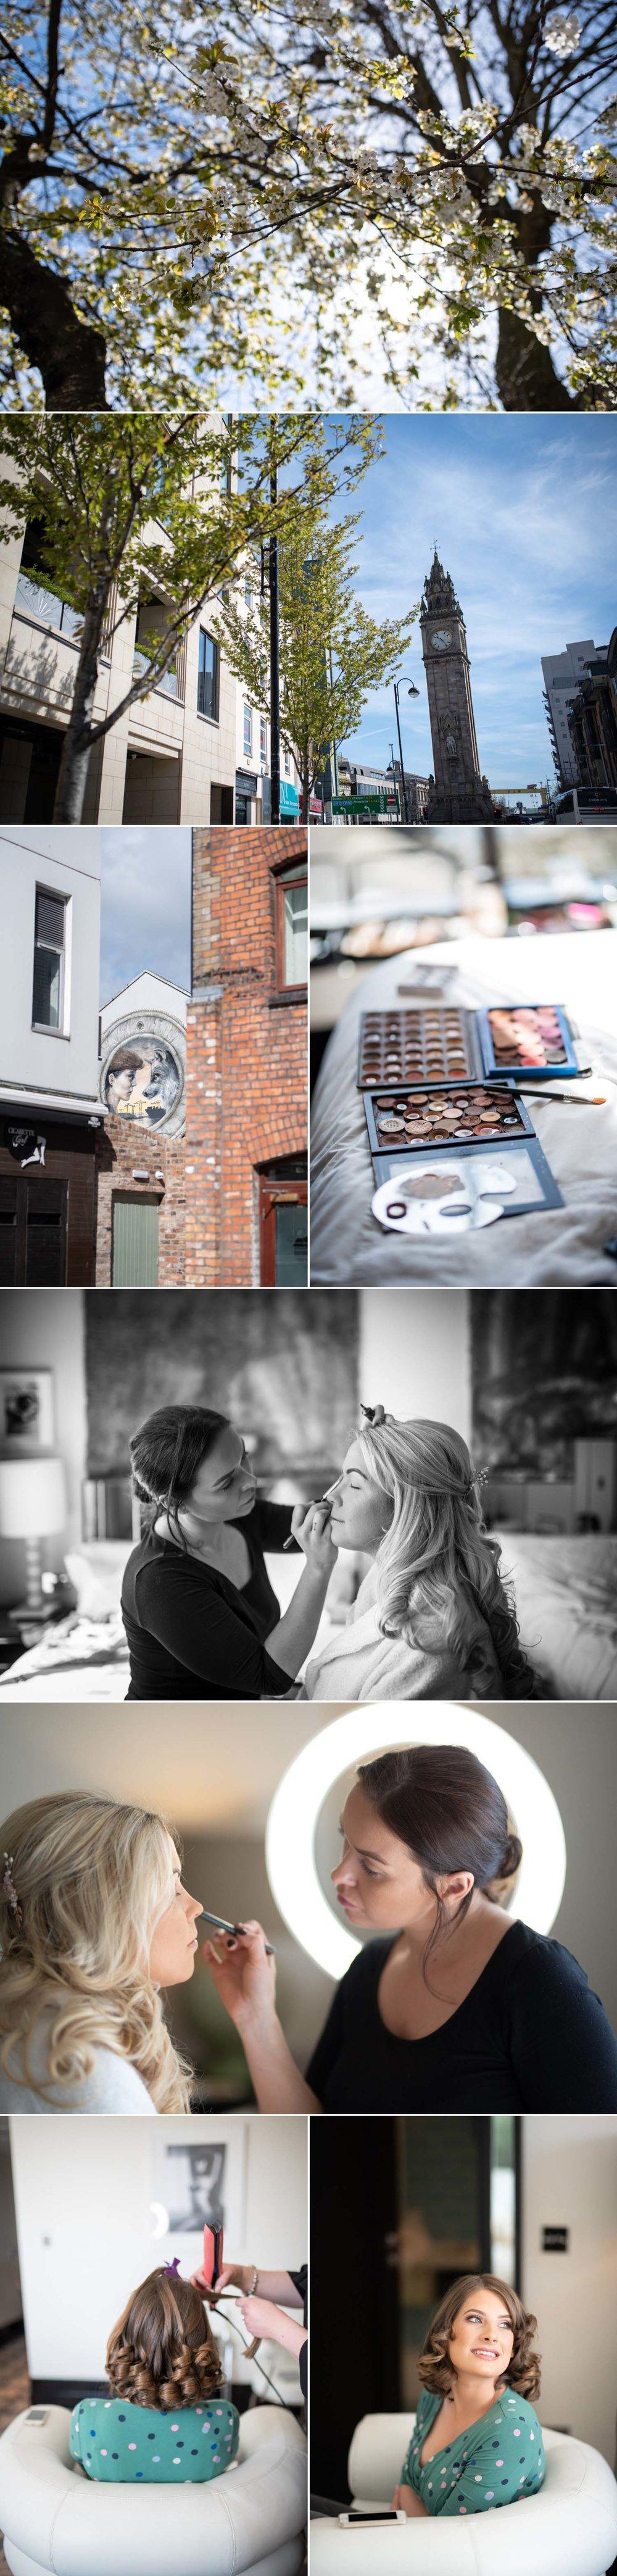 Merchant Hotel Belfast Wedding Photography James McGrillis 01.jpg